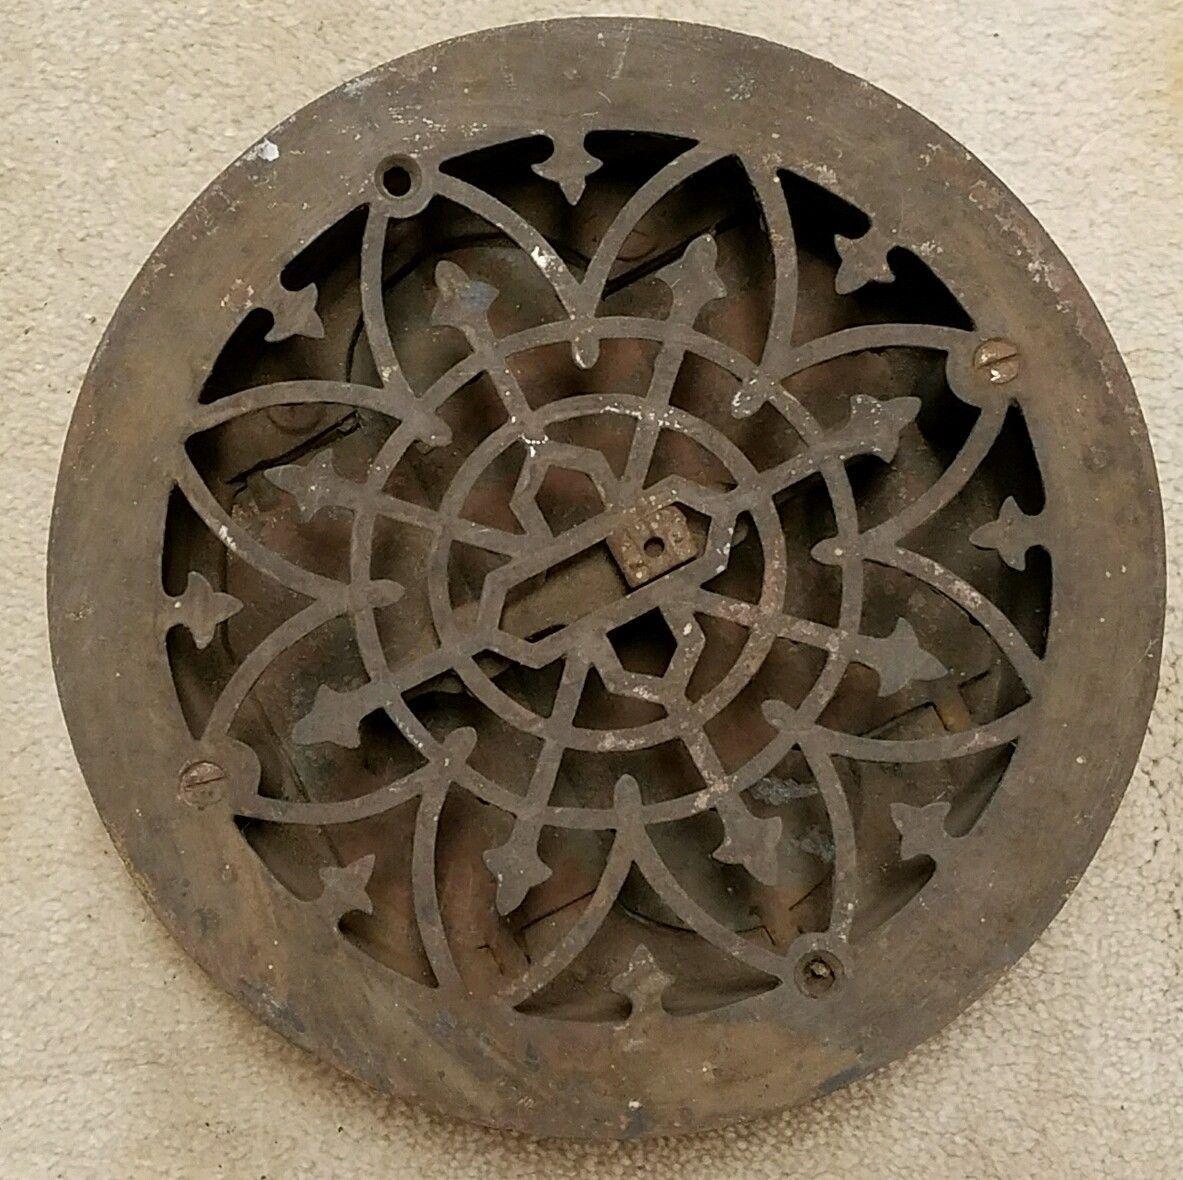 Decorative Grates Registers 1882 Simonds Mfg Co Round Ornate Cast Iron Floor Register Grate